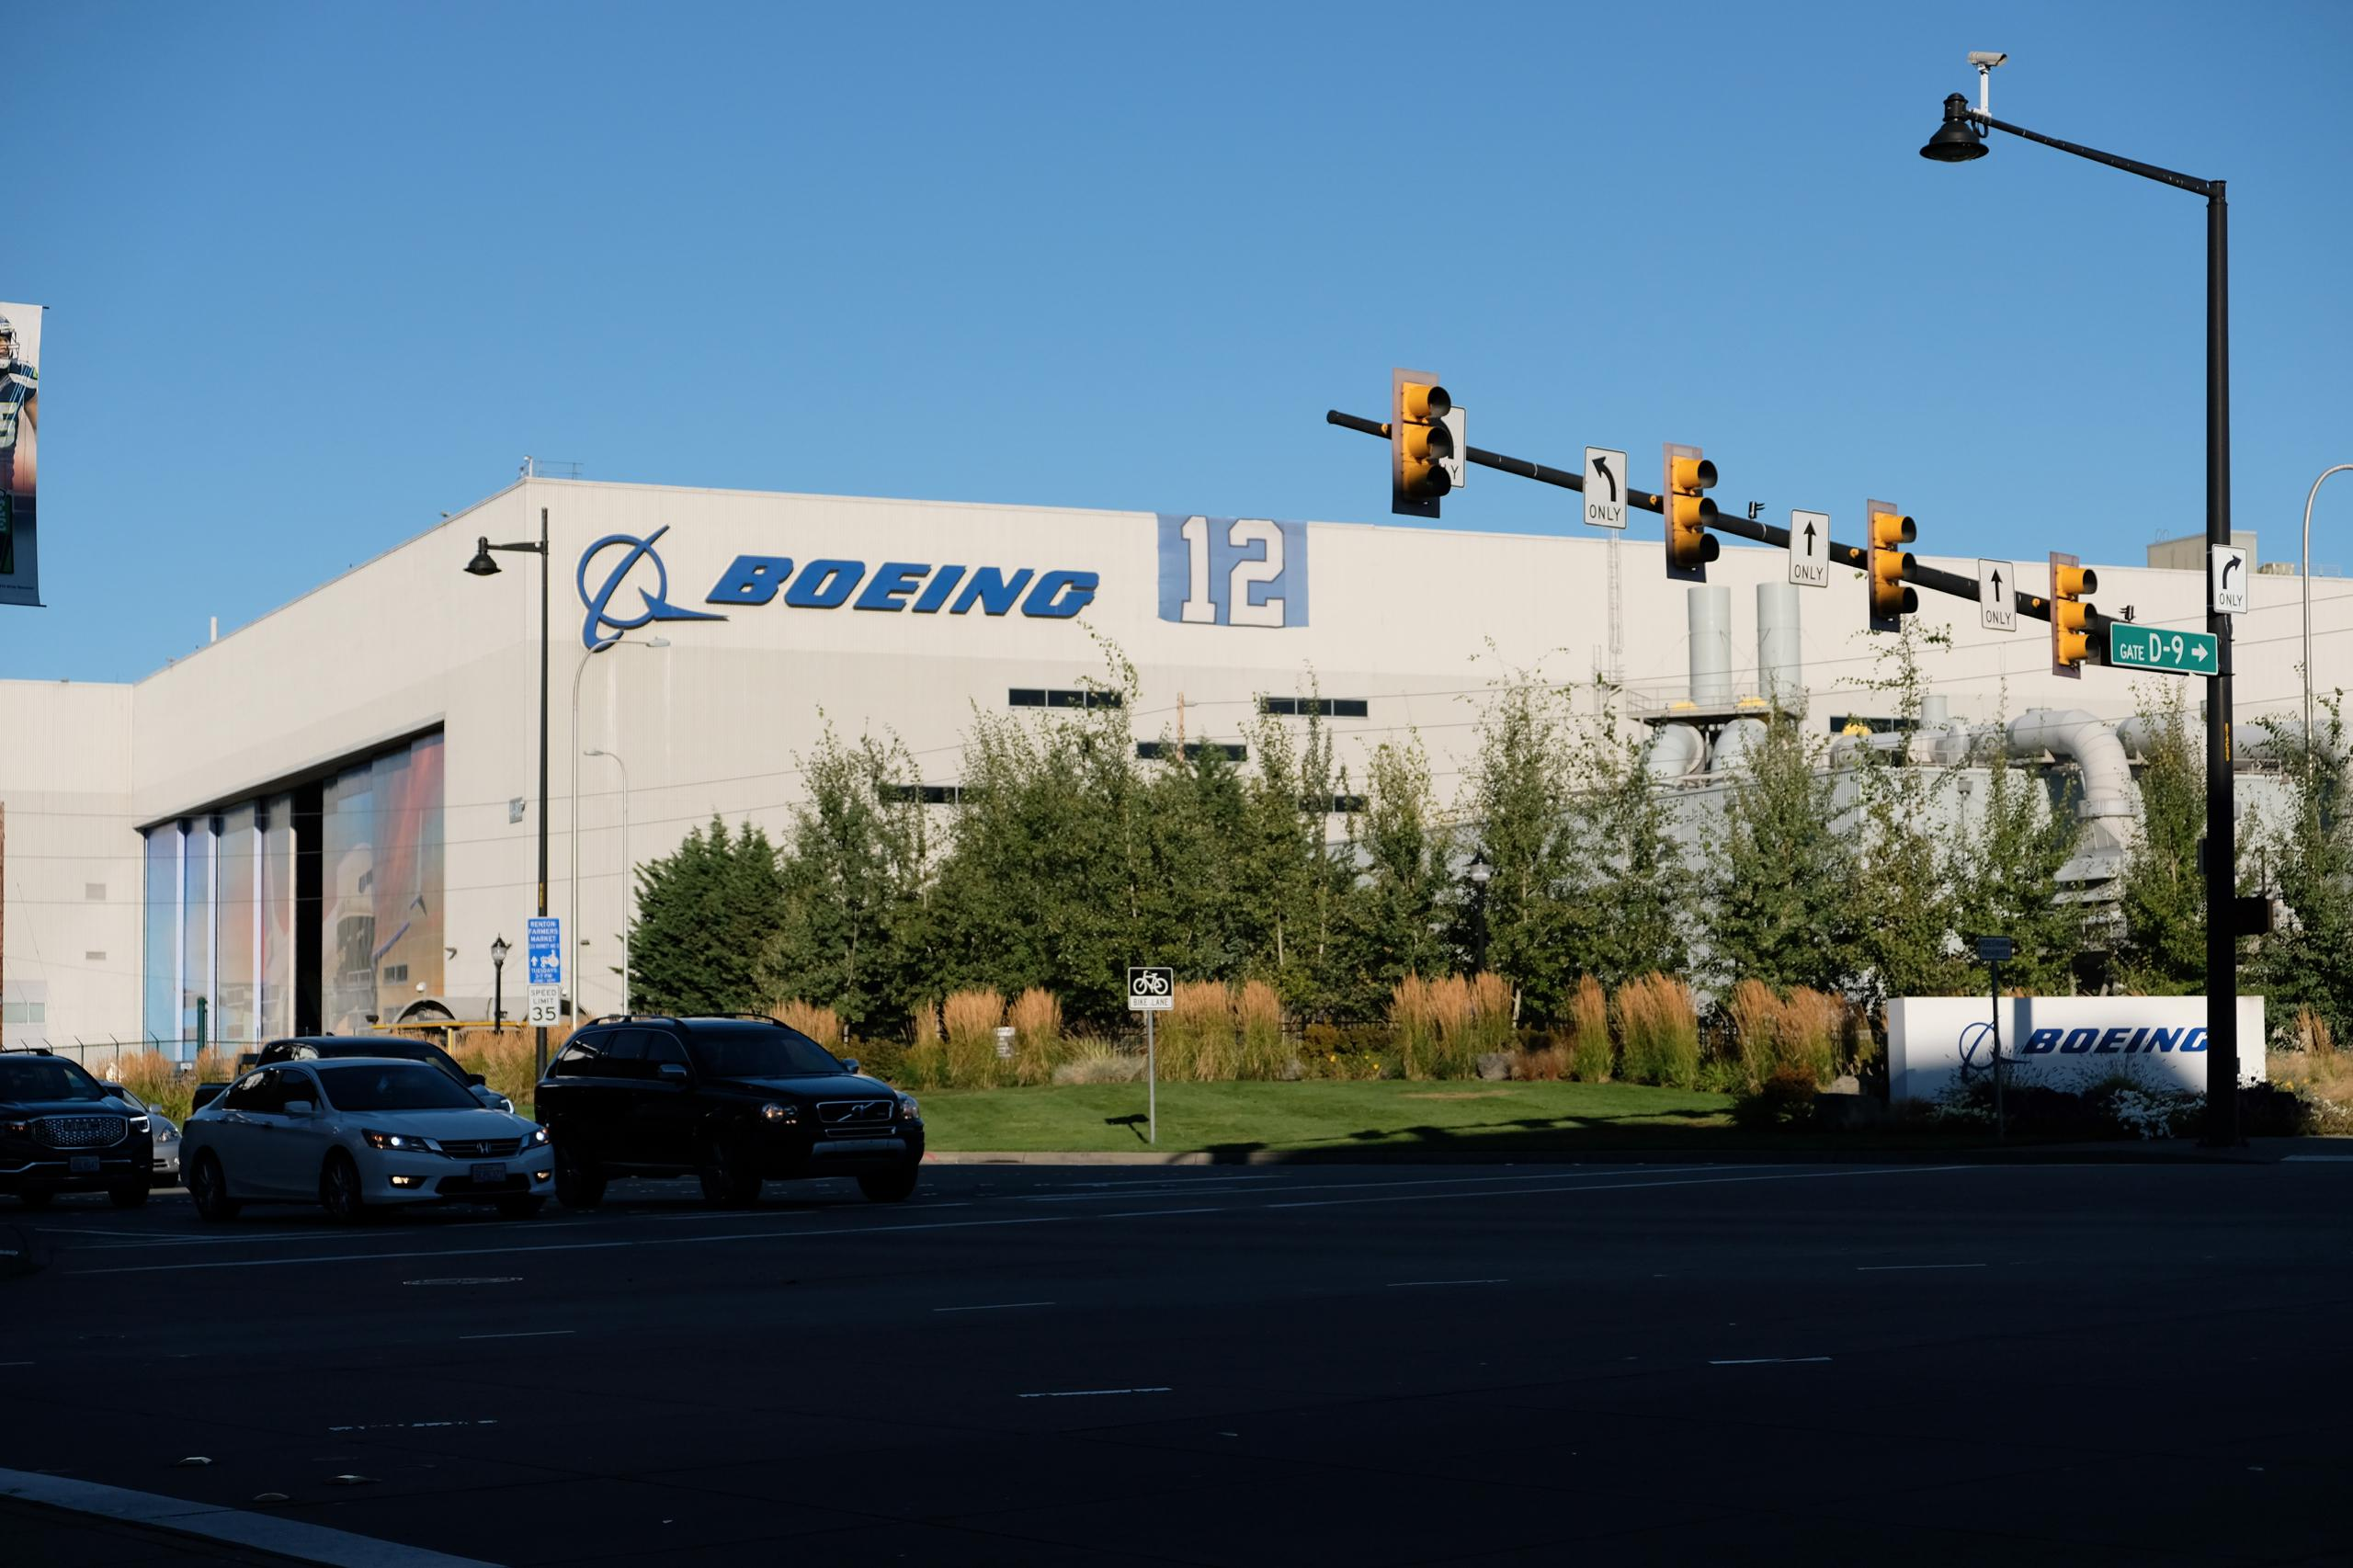 Boeing factory in Bellevue, Washington.